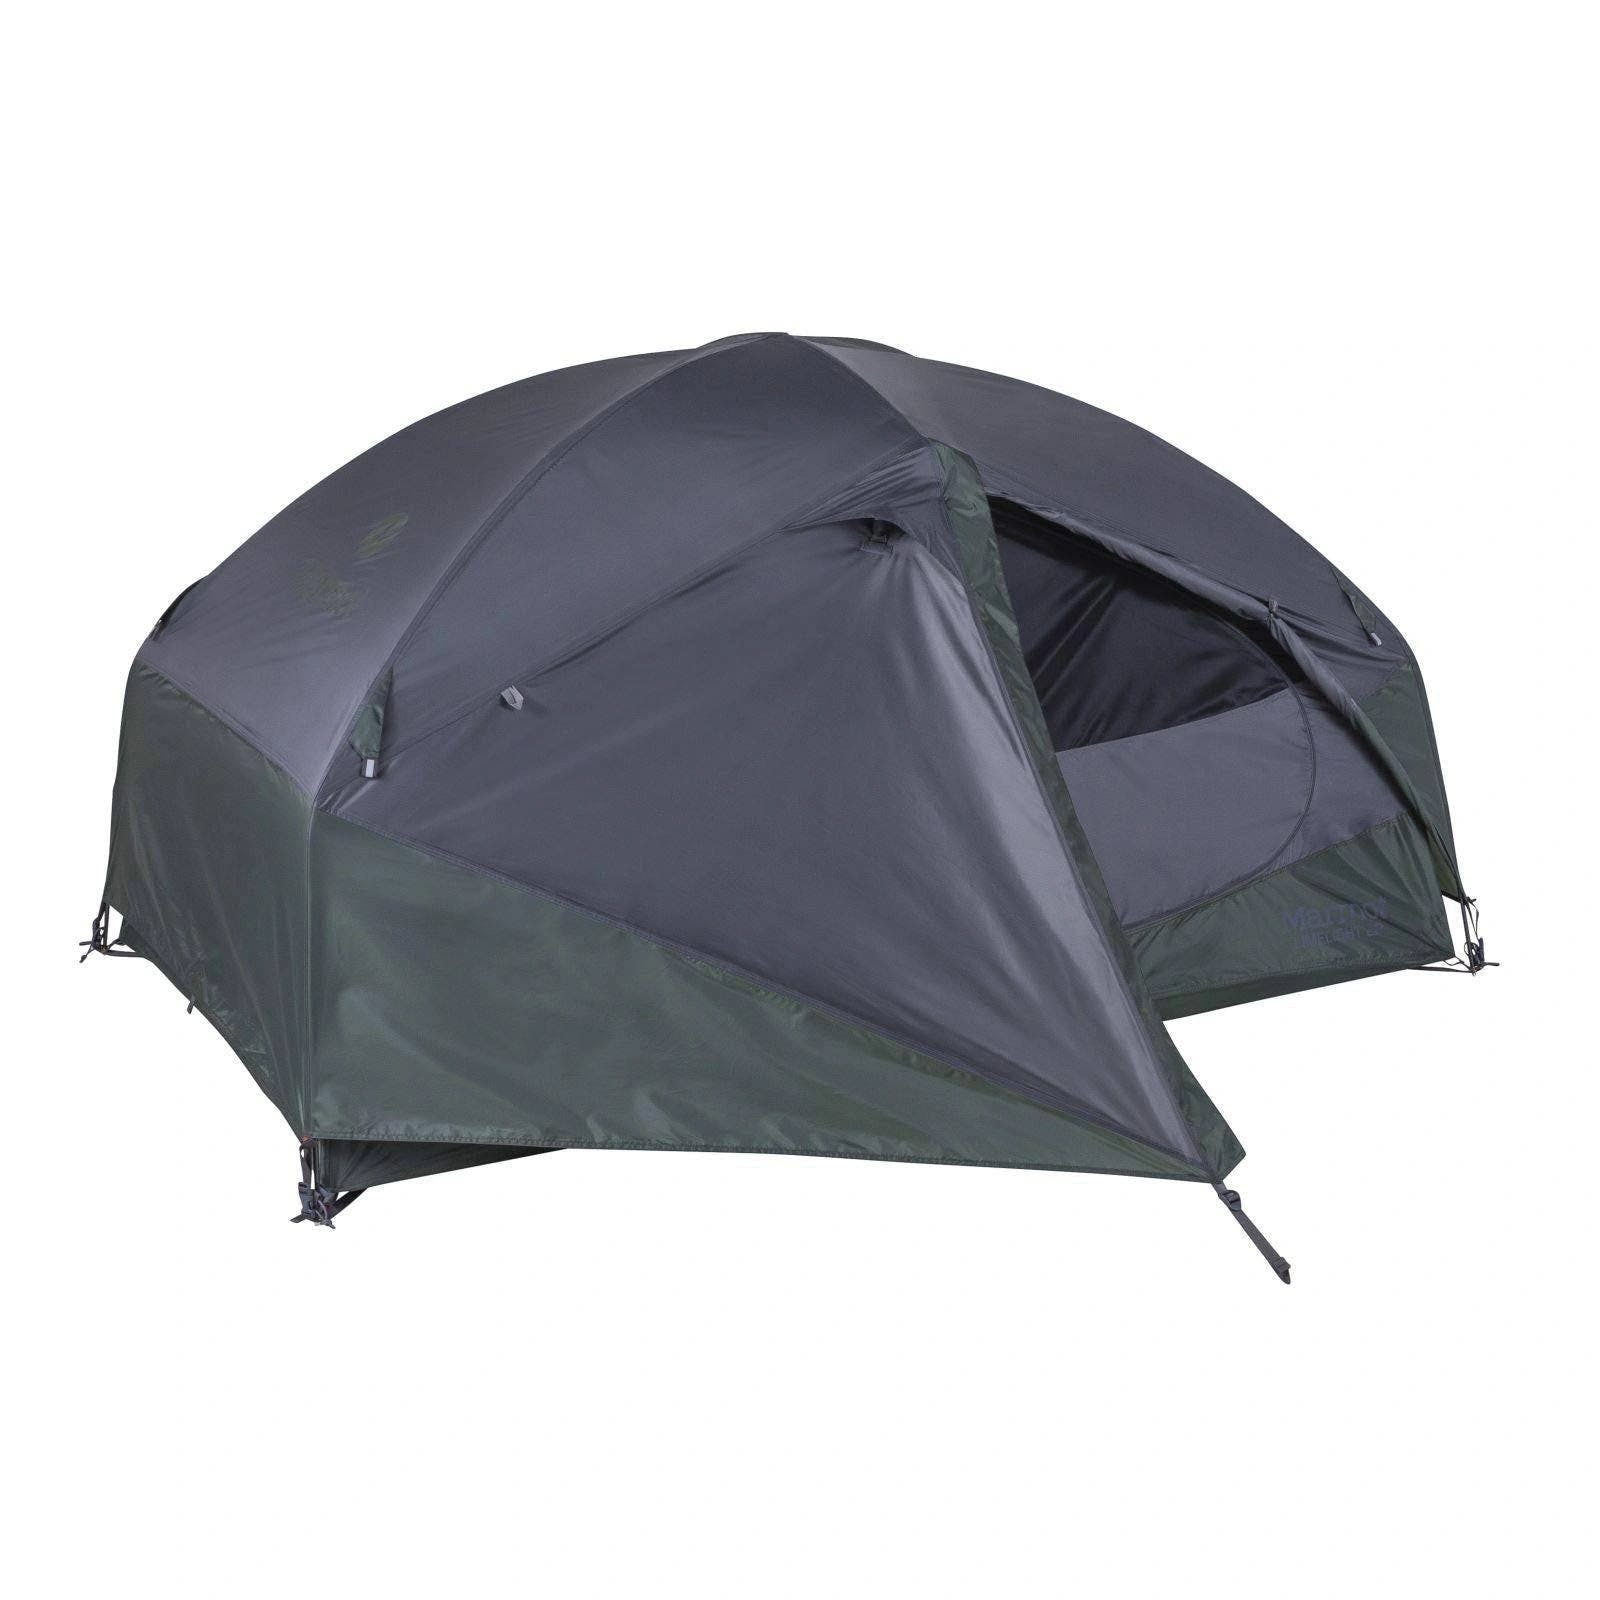 Marmot Limelight 2-Person Tent - Cinder/Crocodile / 2p